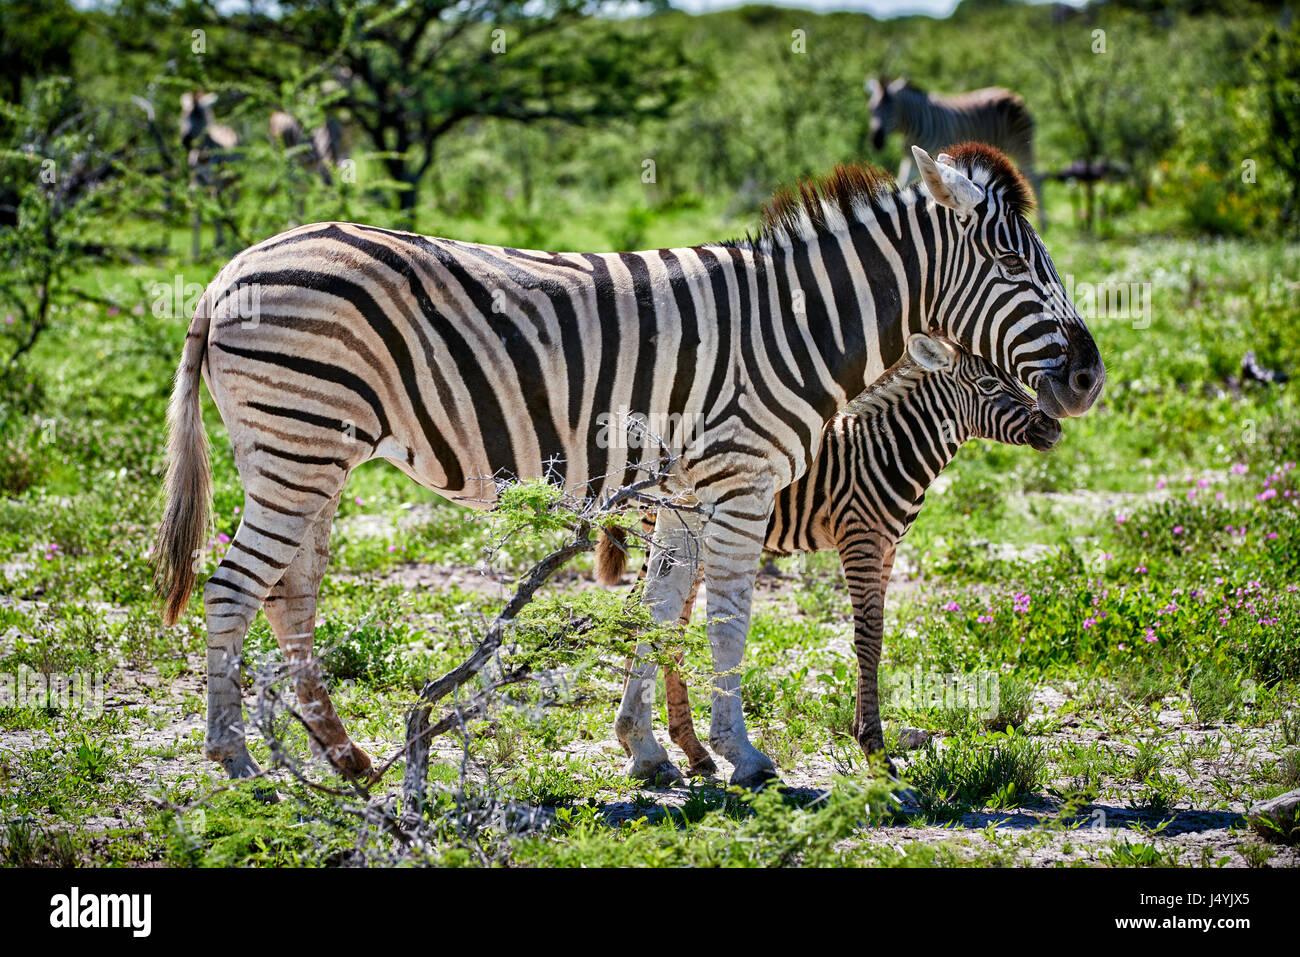 Burchell's zebra, mother with foal, Etosha National Park, Namibia - Stock Image